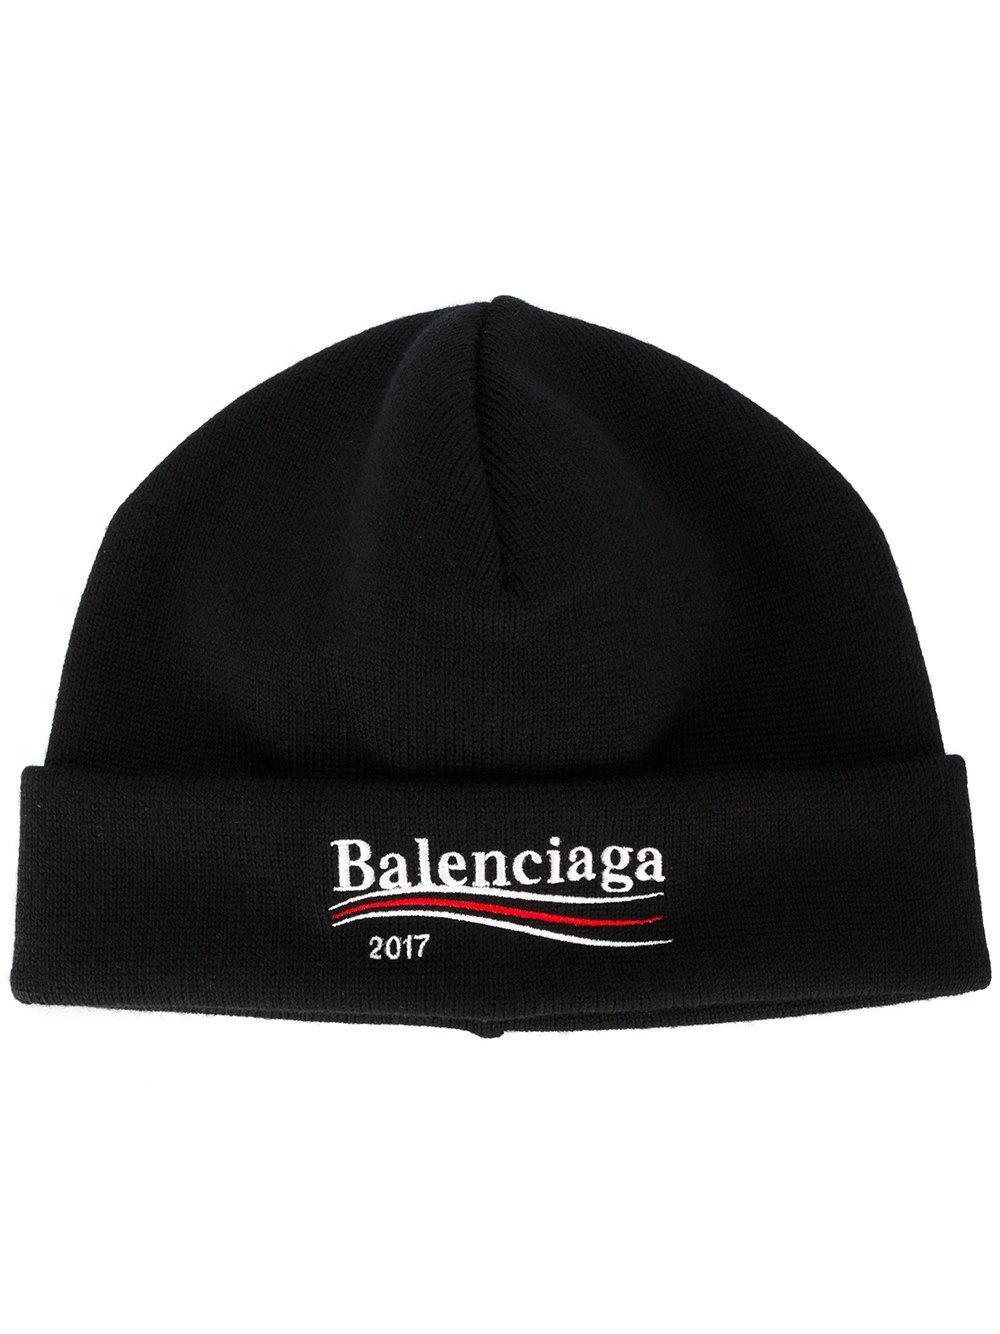 9ed499d9eca Lyst - Balenciaga 2017 Beanie Hat in Black for Men